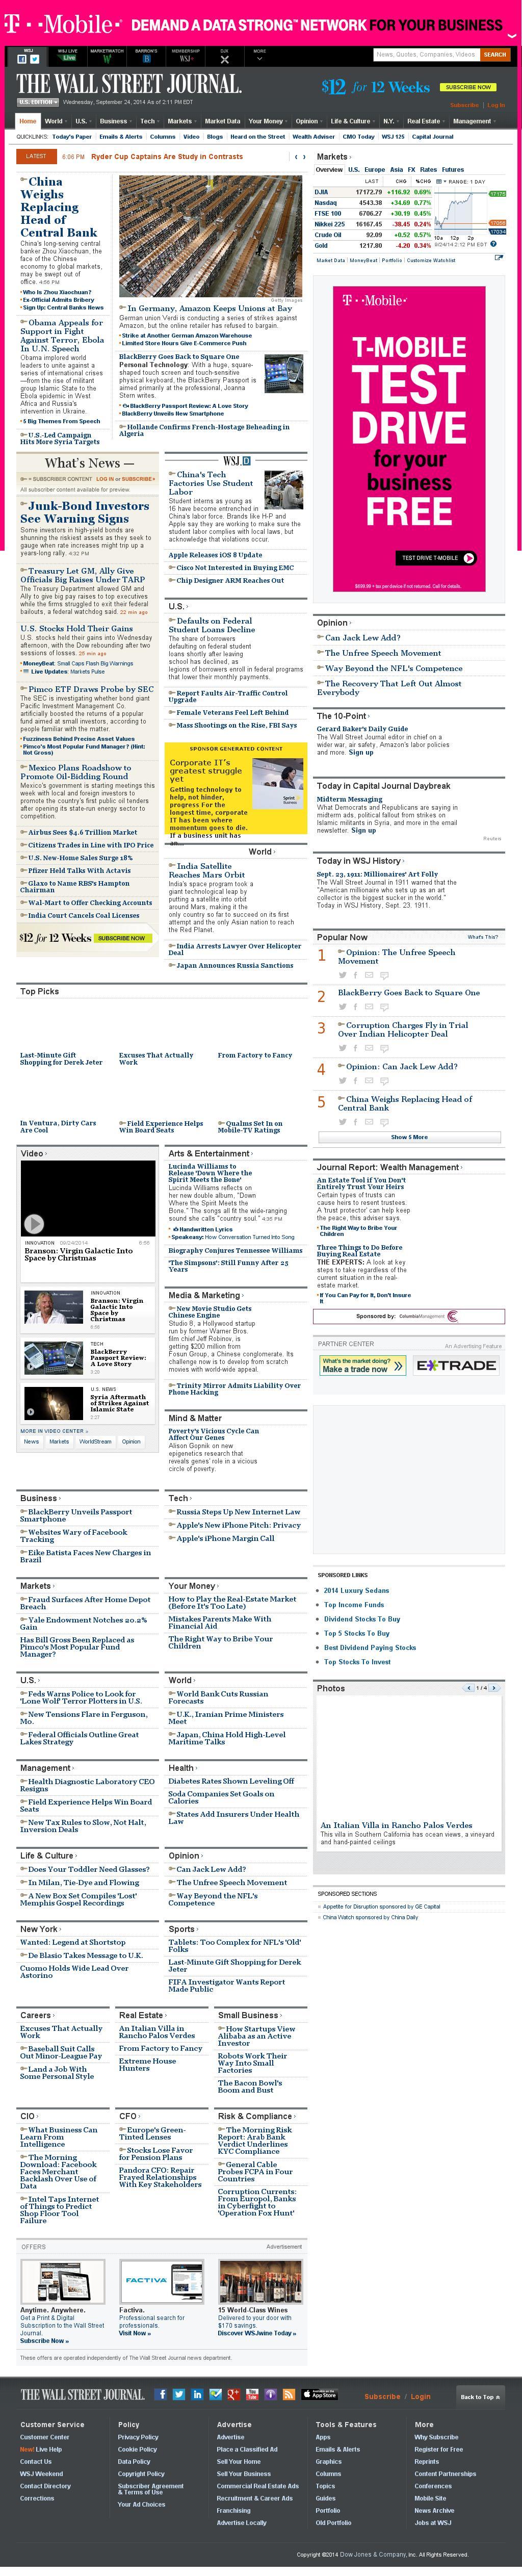 The Wall Street Journal at Wednesday Sept. 24, 2014, 6:18 p.m. UTC